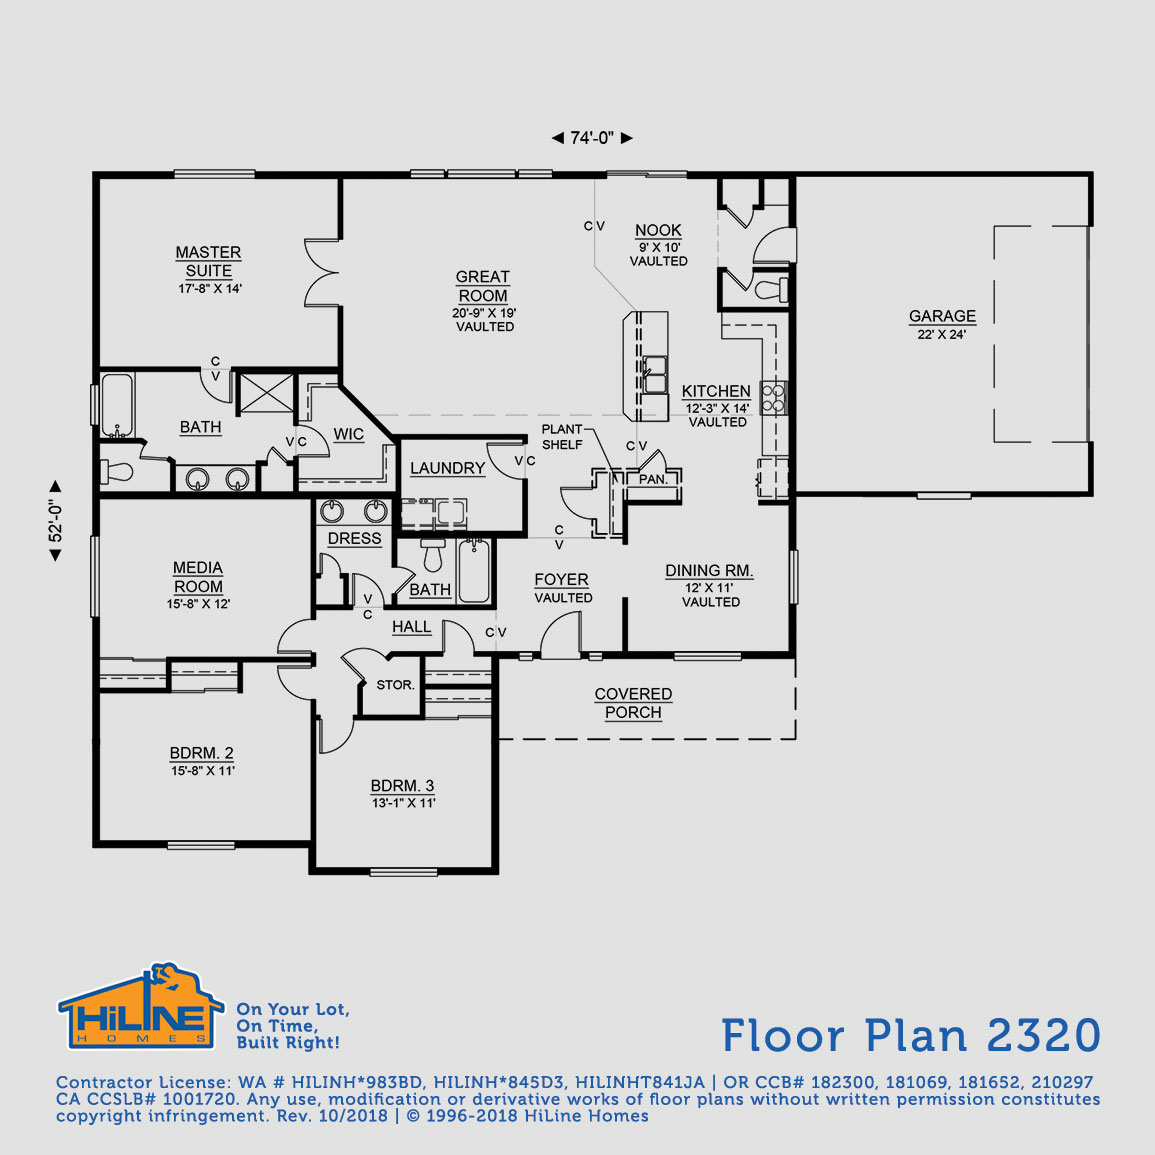 Floorplan 2320 | HiLine Homes on sloped lot floor plans, zero lot line home, huge master suite house plans, zero-entry house plans, zero lot line design,